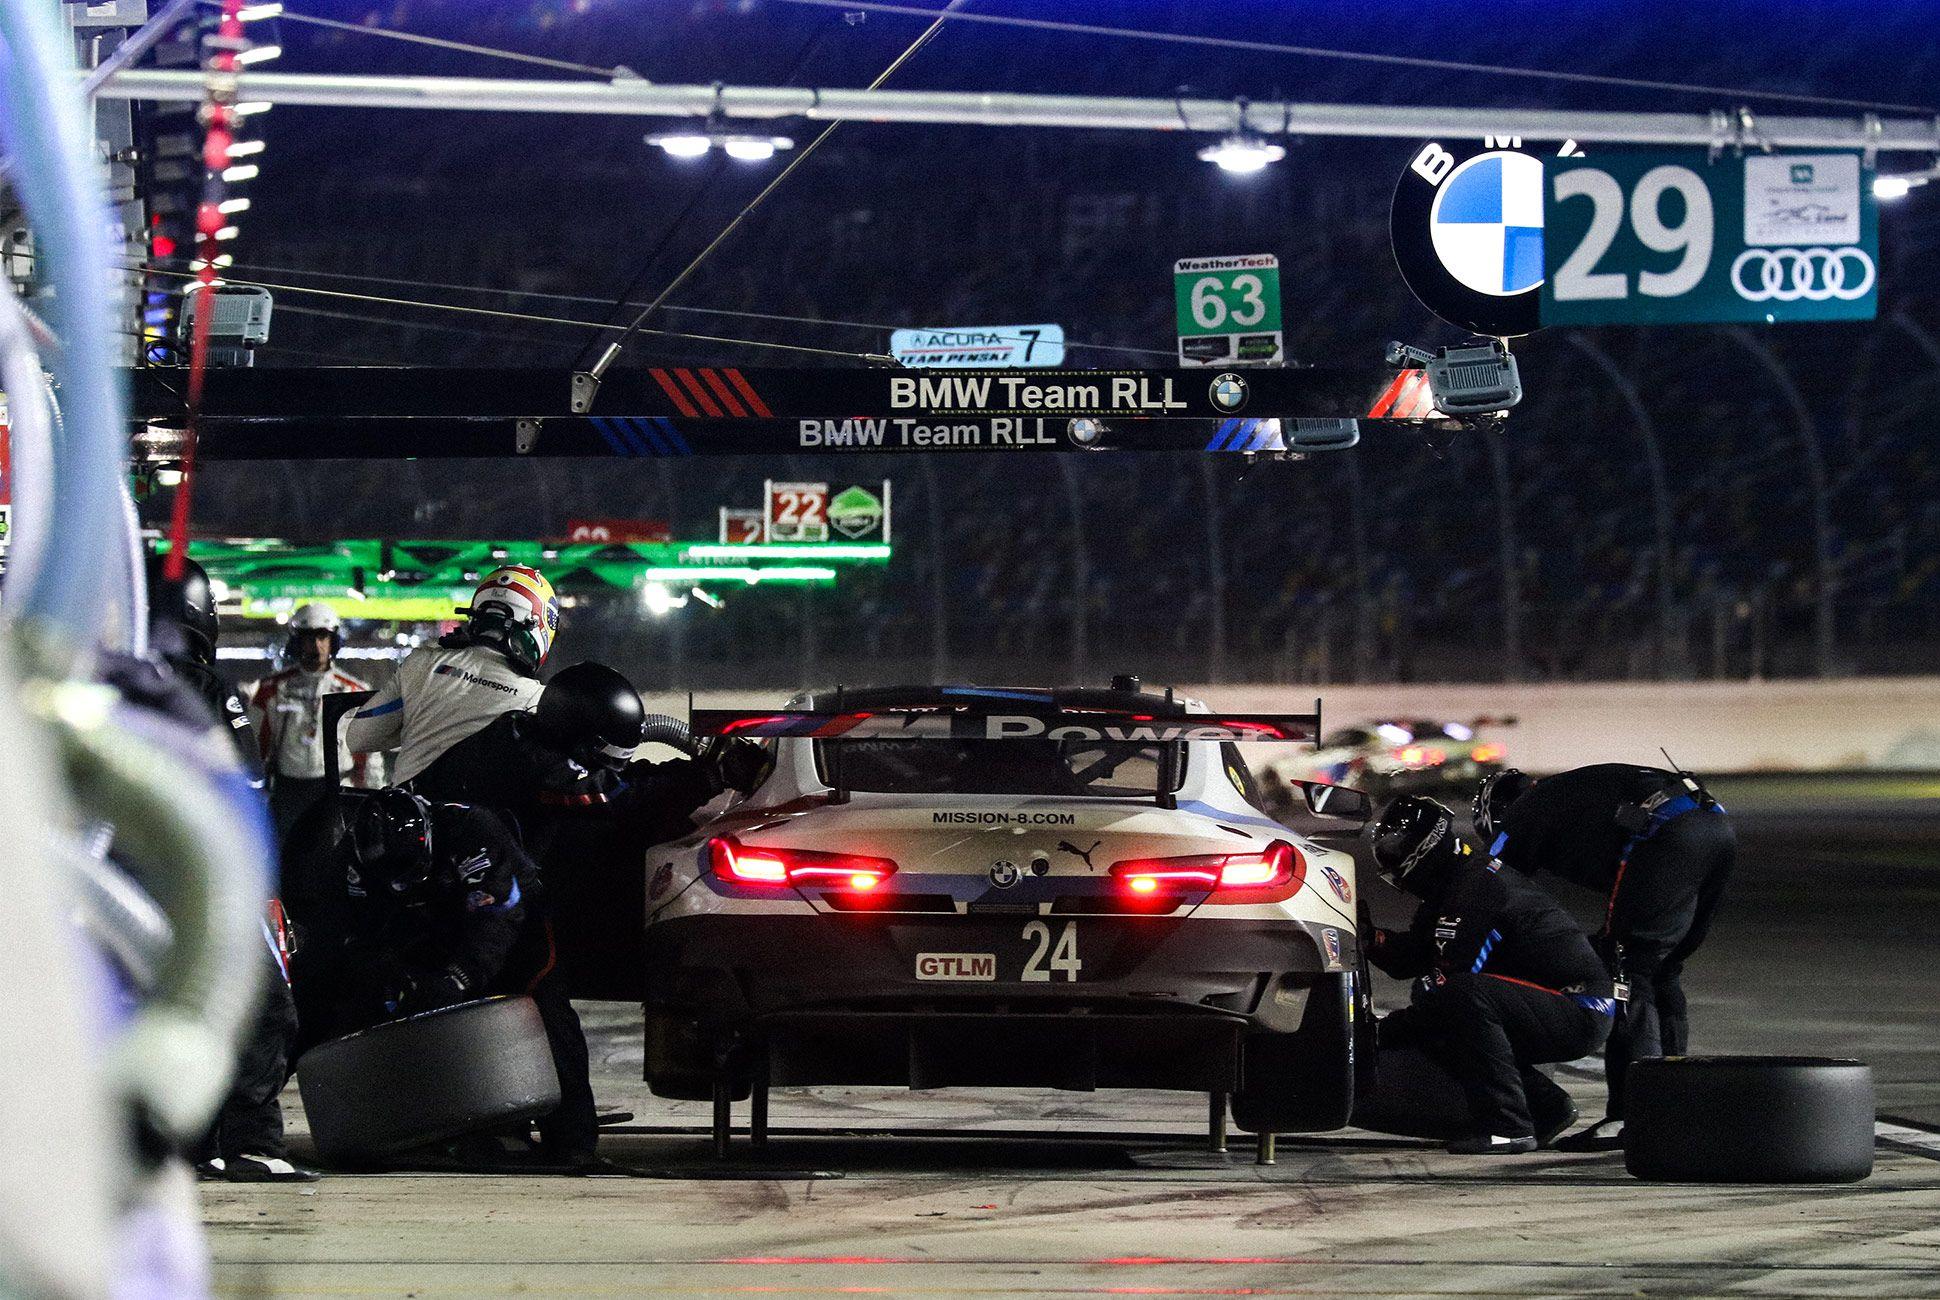 Best-Sports-Cars-of-2018-Daytona-24-Hours-gear-patrol-BMW-M8-GTE-3